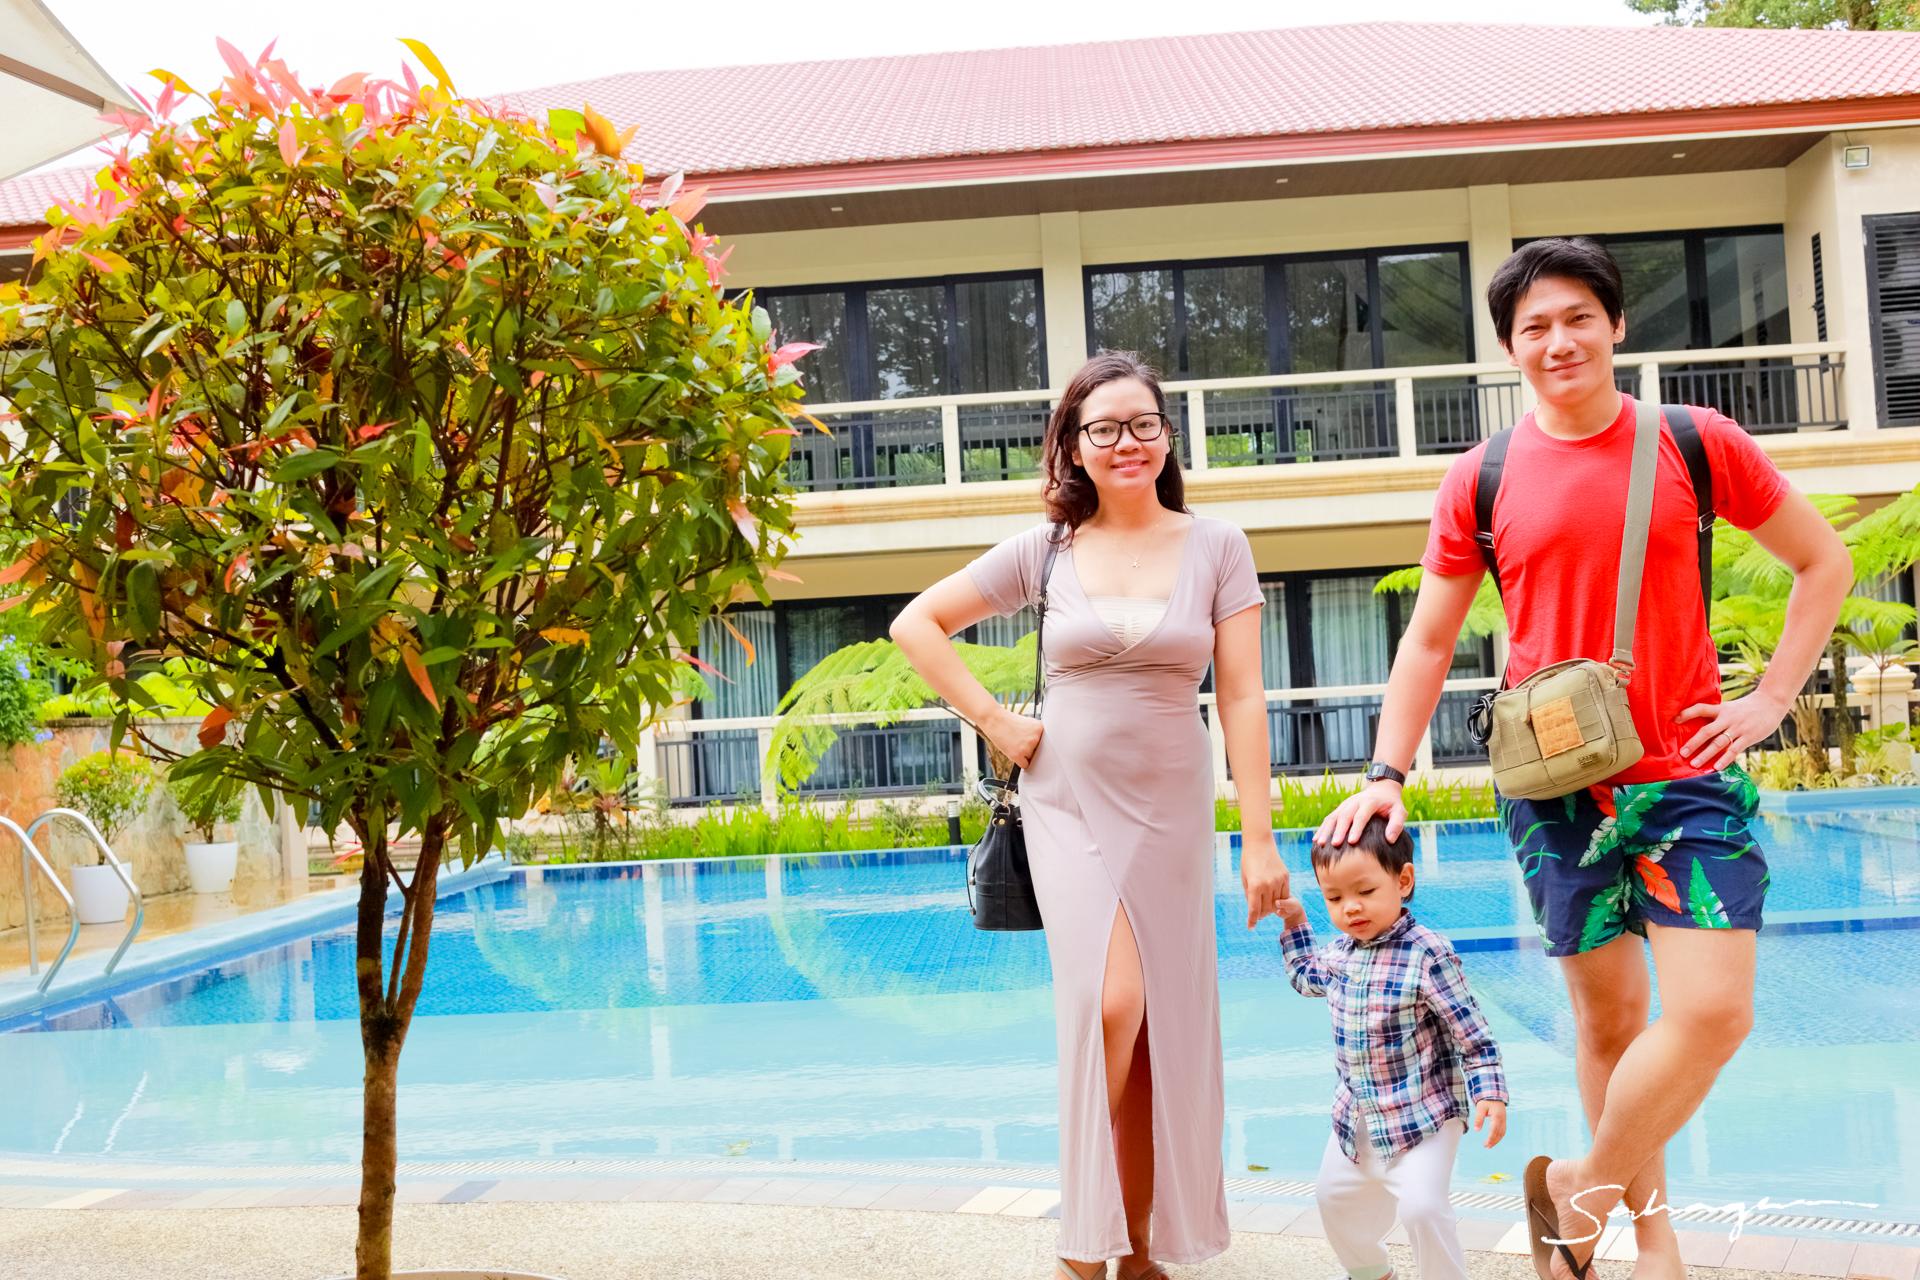 At Hillcreek Gardens Tagaytay